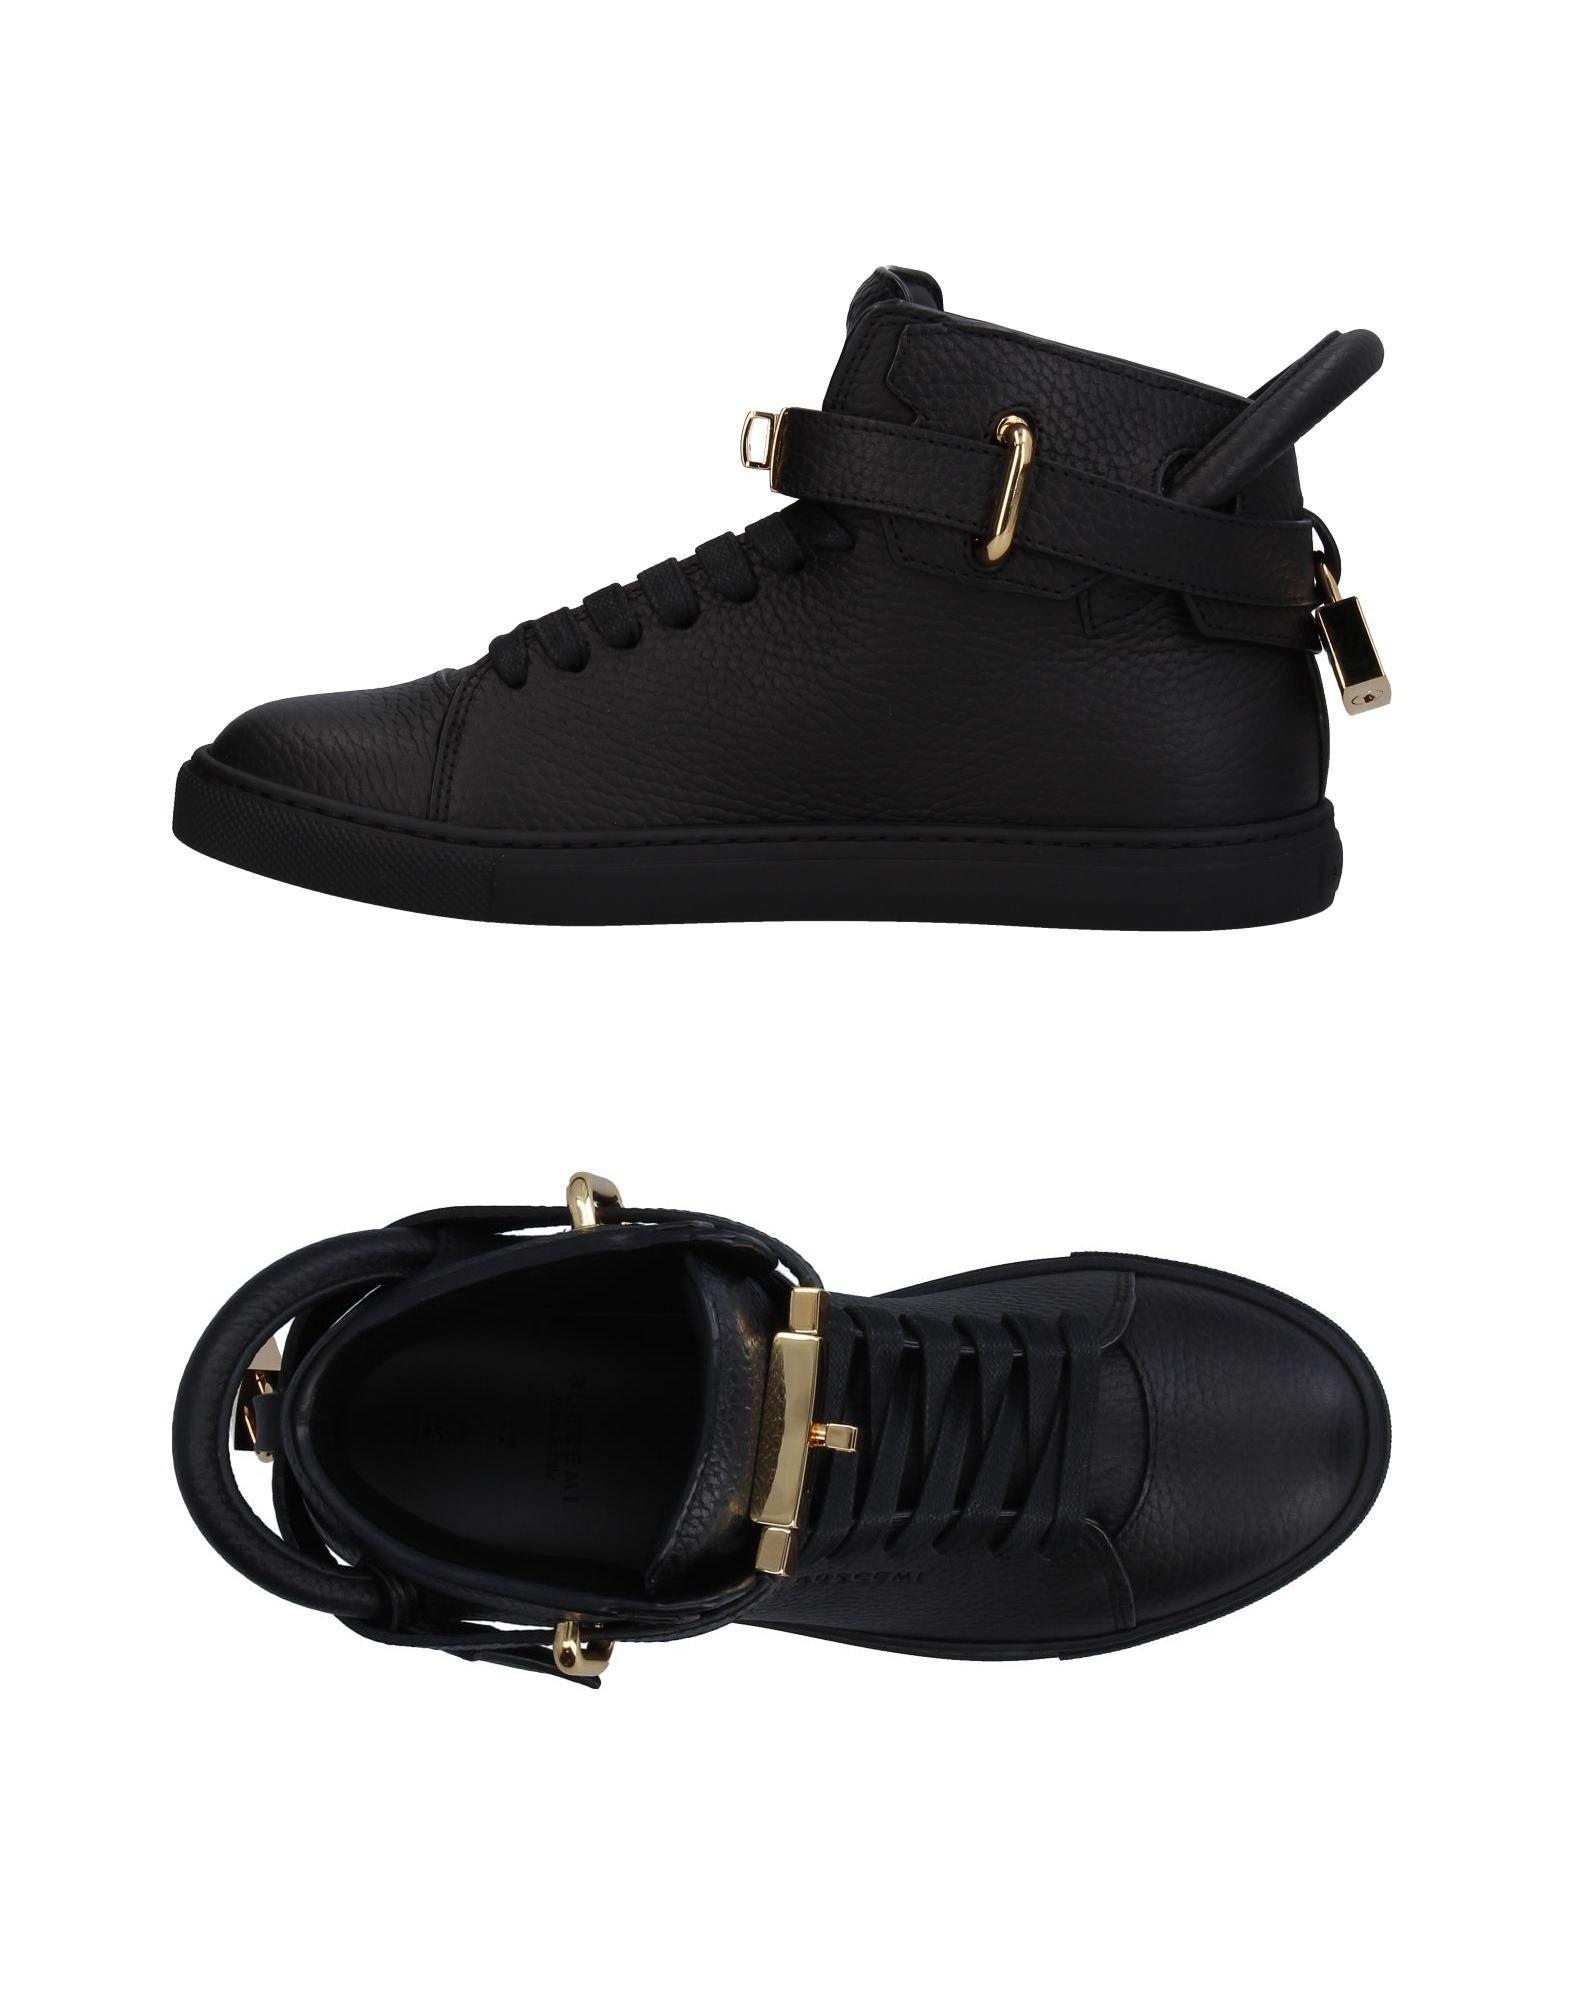 Buscemi Sneakers Damen Schuhe  11358186JK Heiße Schuhe Damen 19b63c